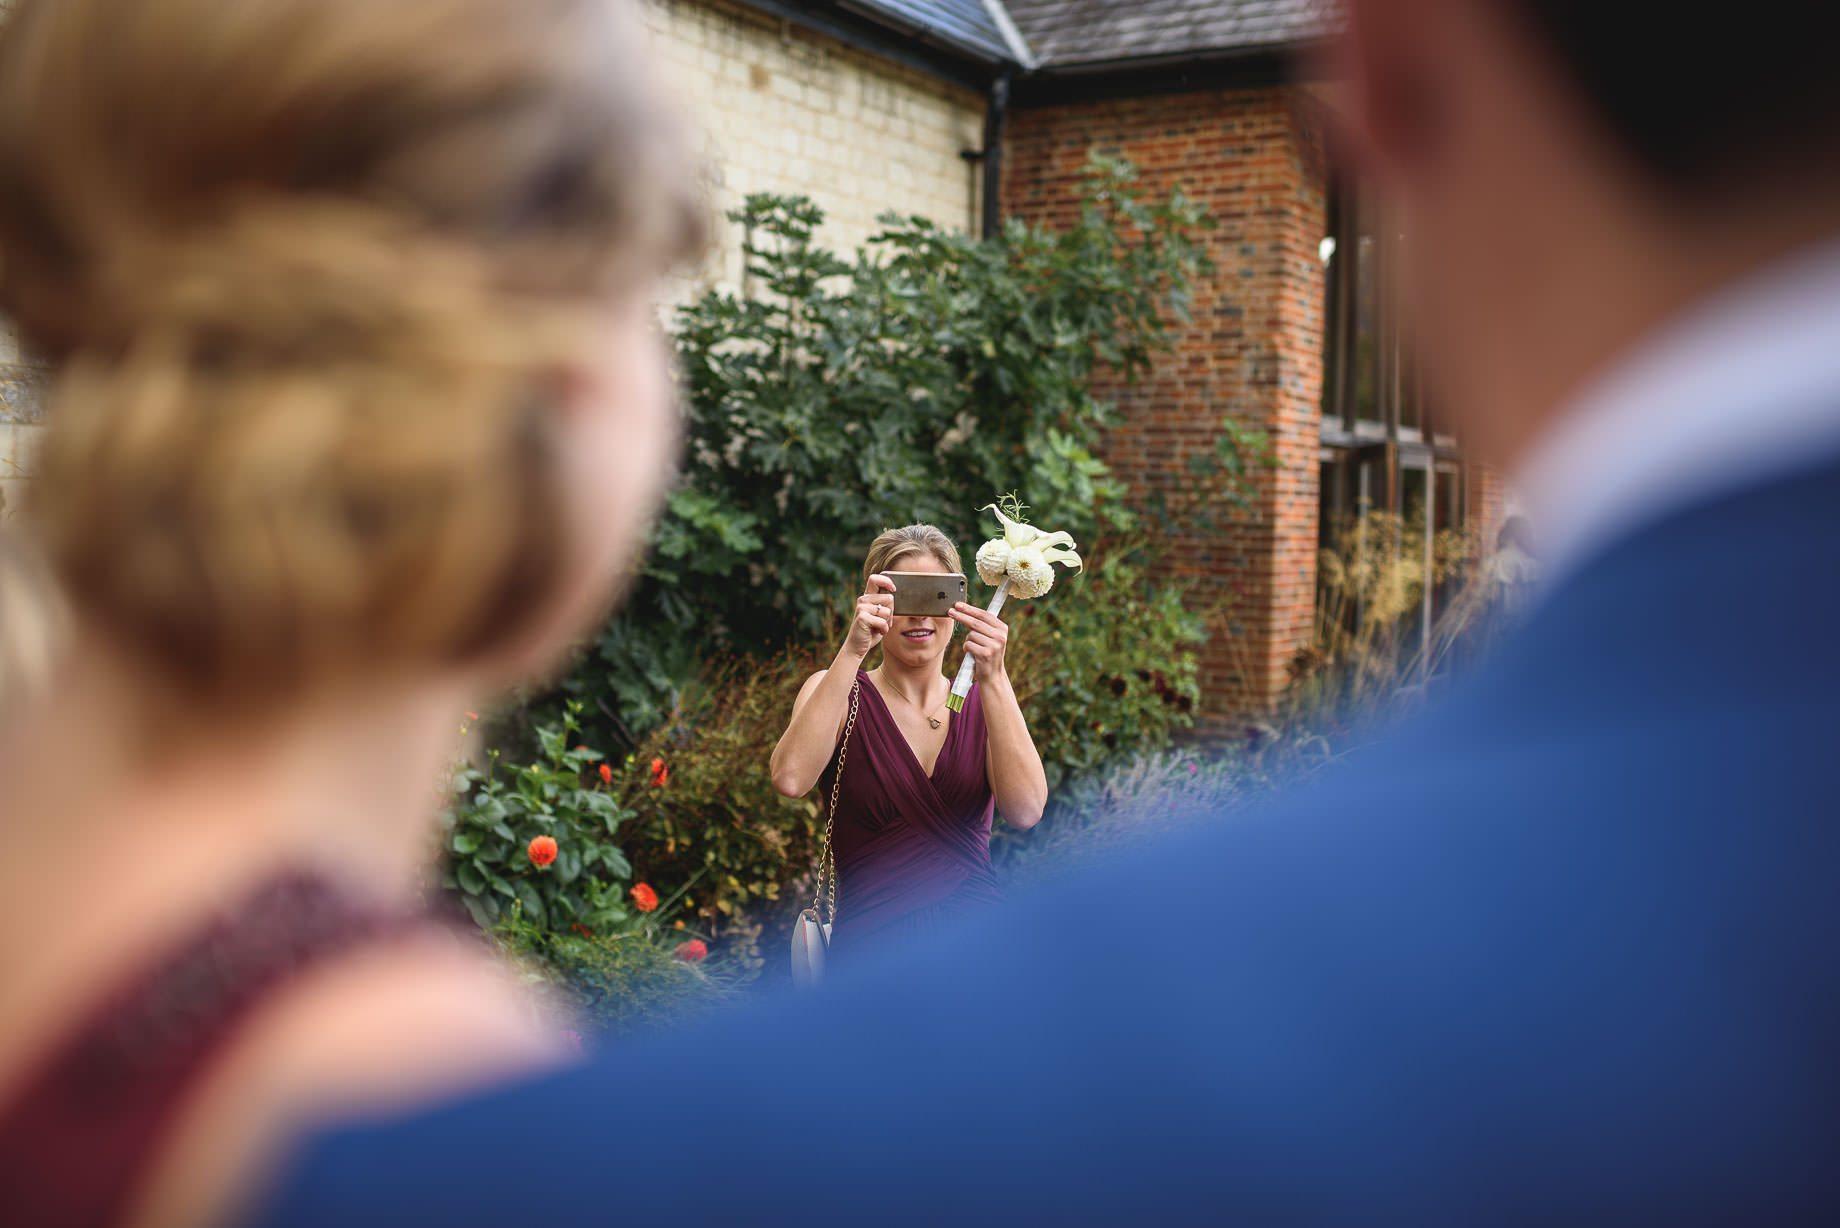 bury-court-barn-wedding-photography-guy-collier-photography-nadia-tom-90-of-184